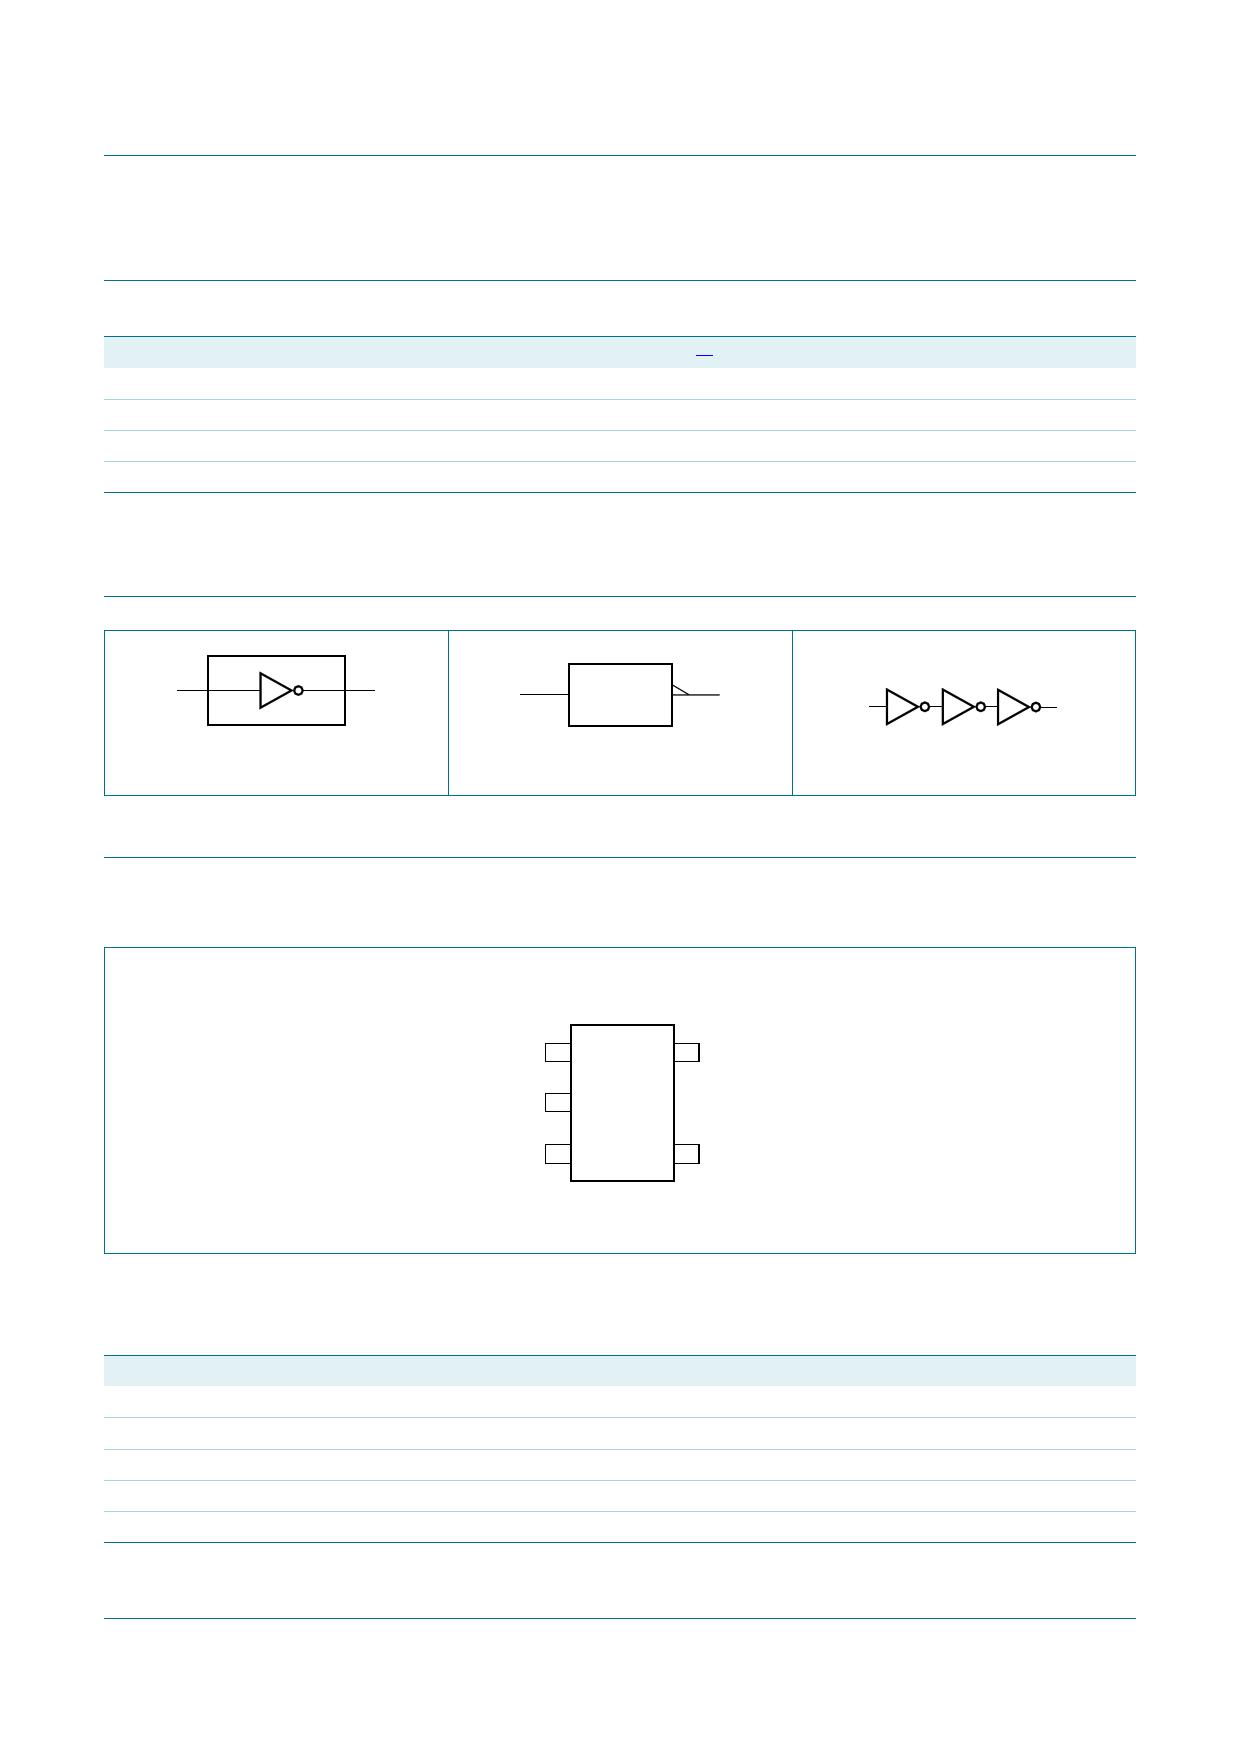 74HC1G04 pdf, equivalent, schematic